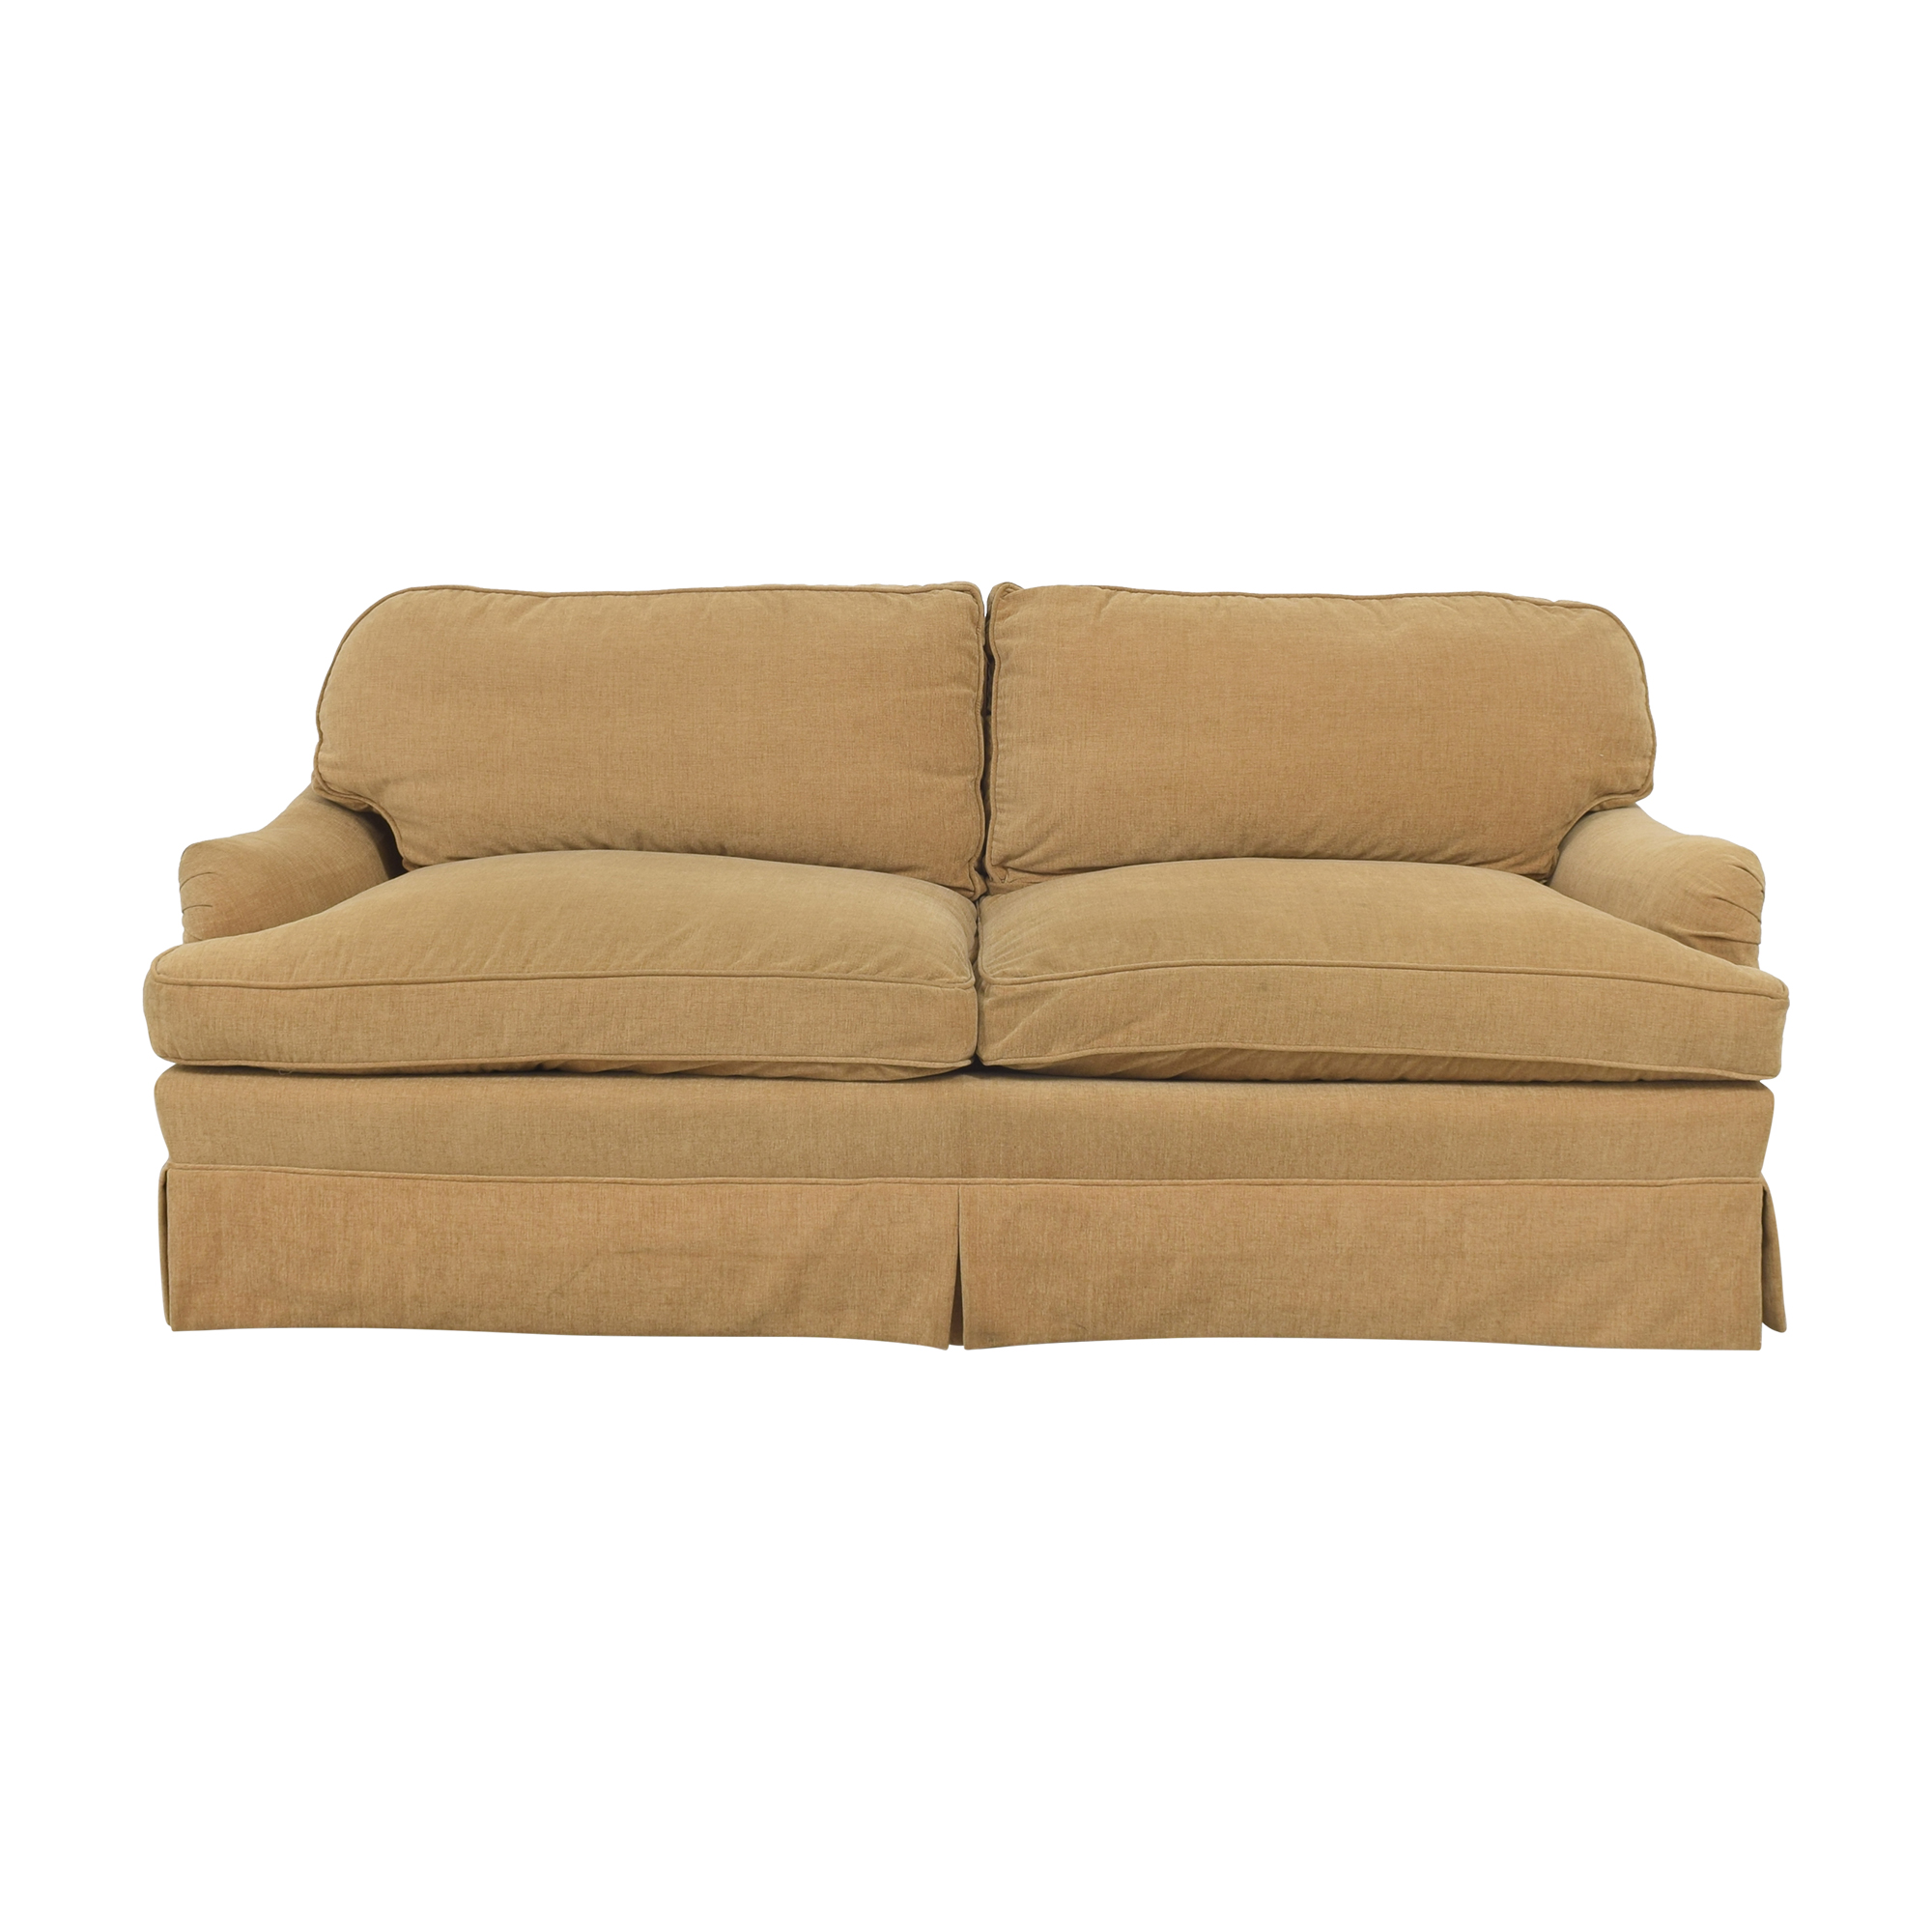 Greenbaum Interiors Greenbaum Interiors Two Cushion Skirted Sofa nj